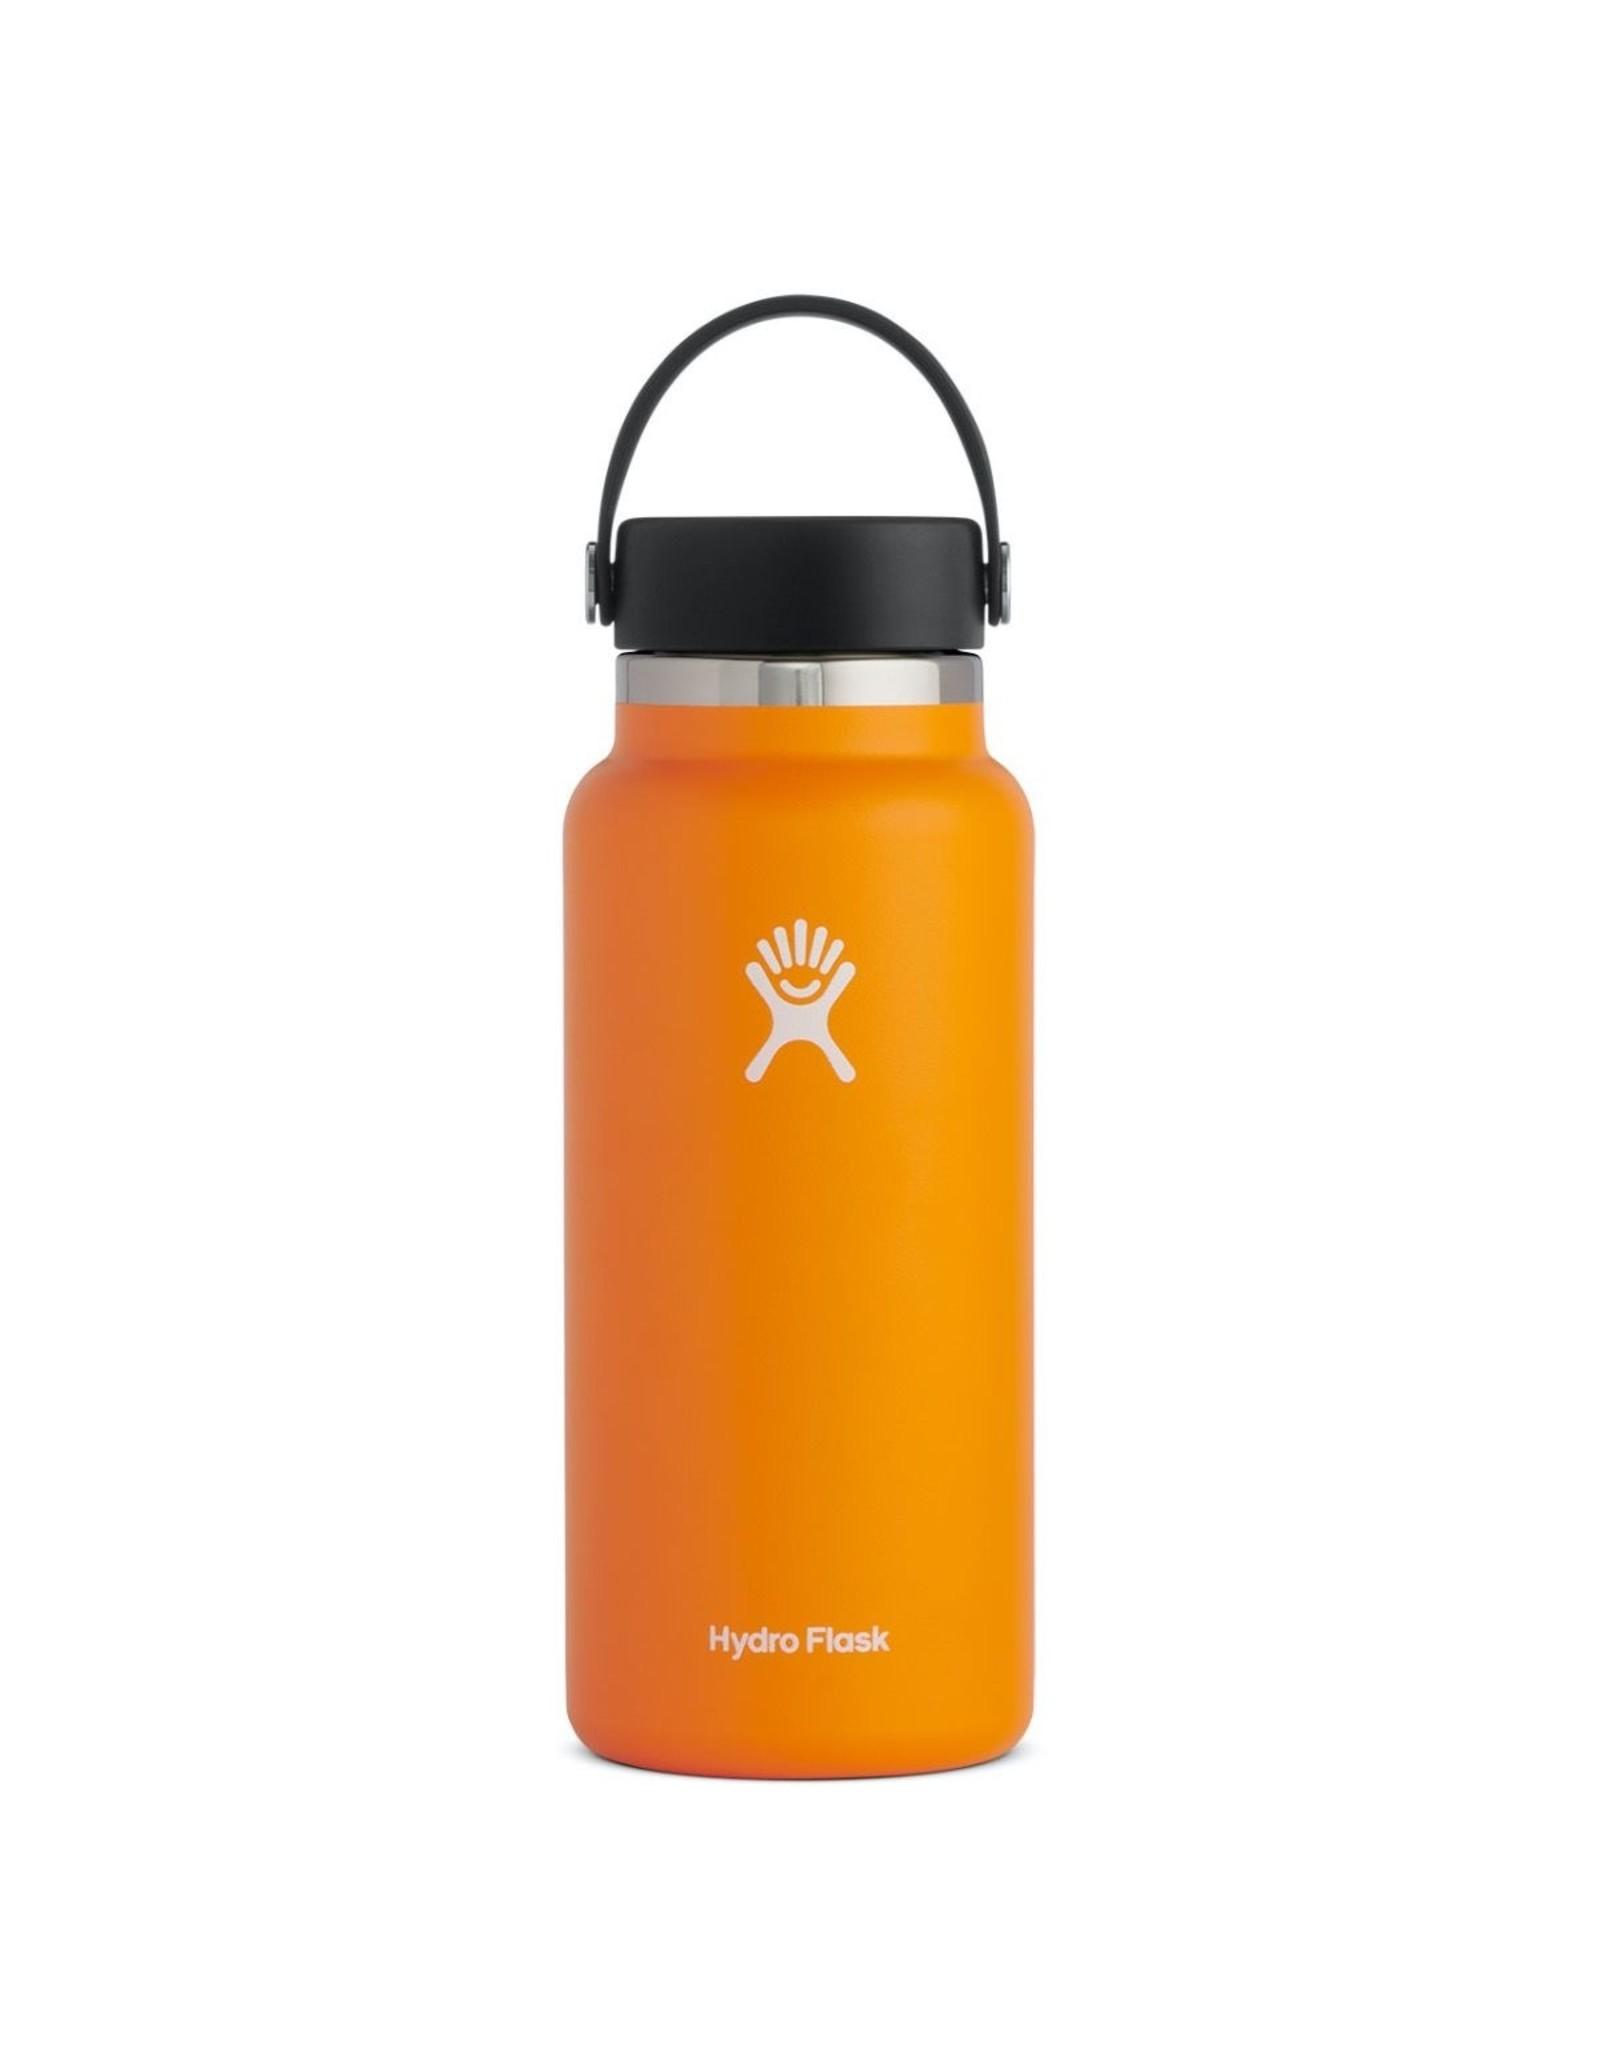 Hydro Flask Hydro Flask 32oz Wide Mouth w/ Flex Cap Clementine